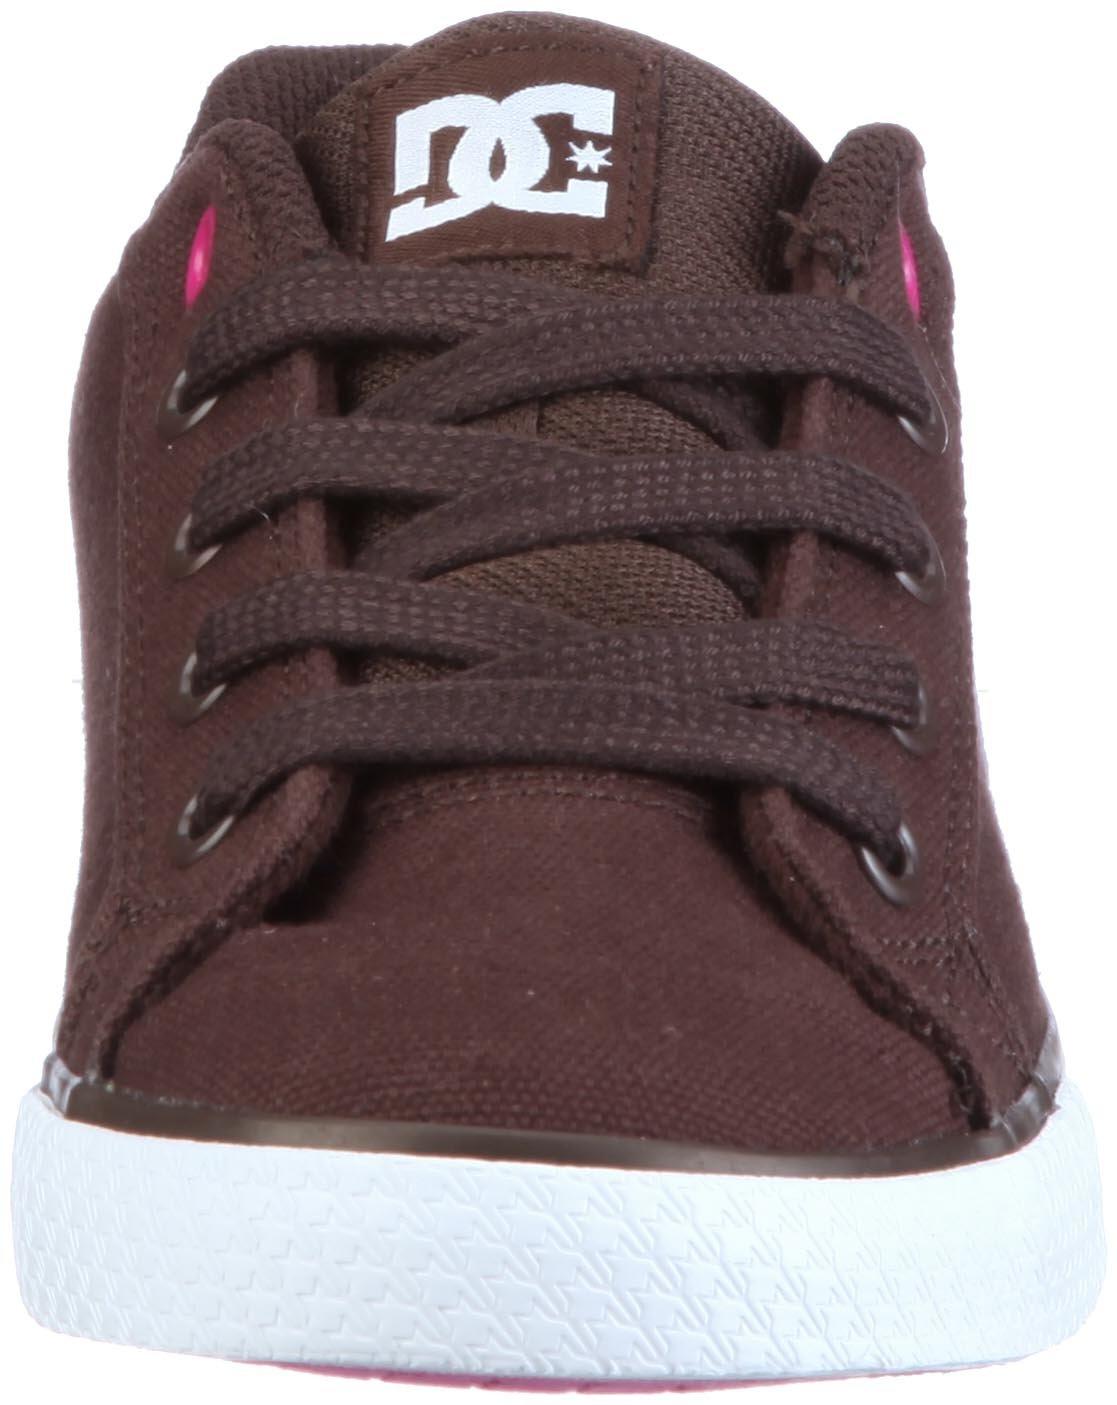 DC Women's Chelsea Tx Action Sports Shoe B004LZ4RN6 6 B(M) US|Dark Chocolate